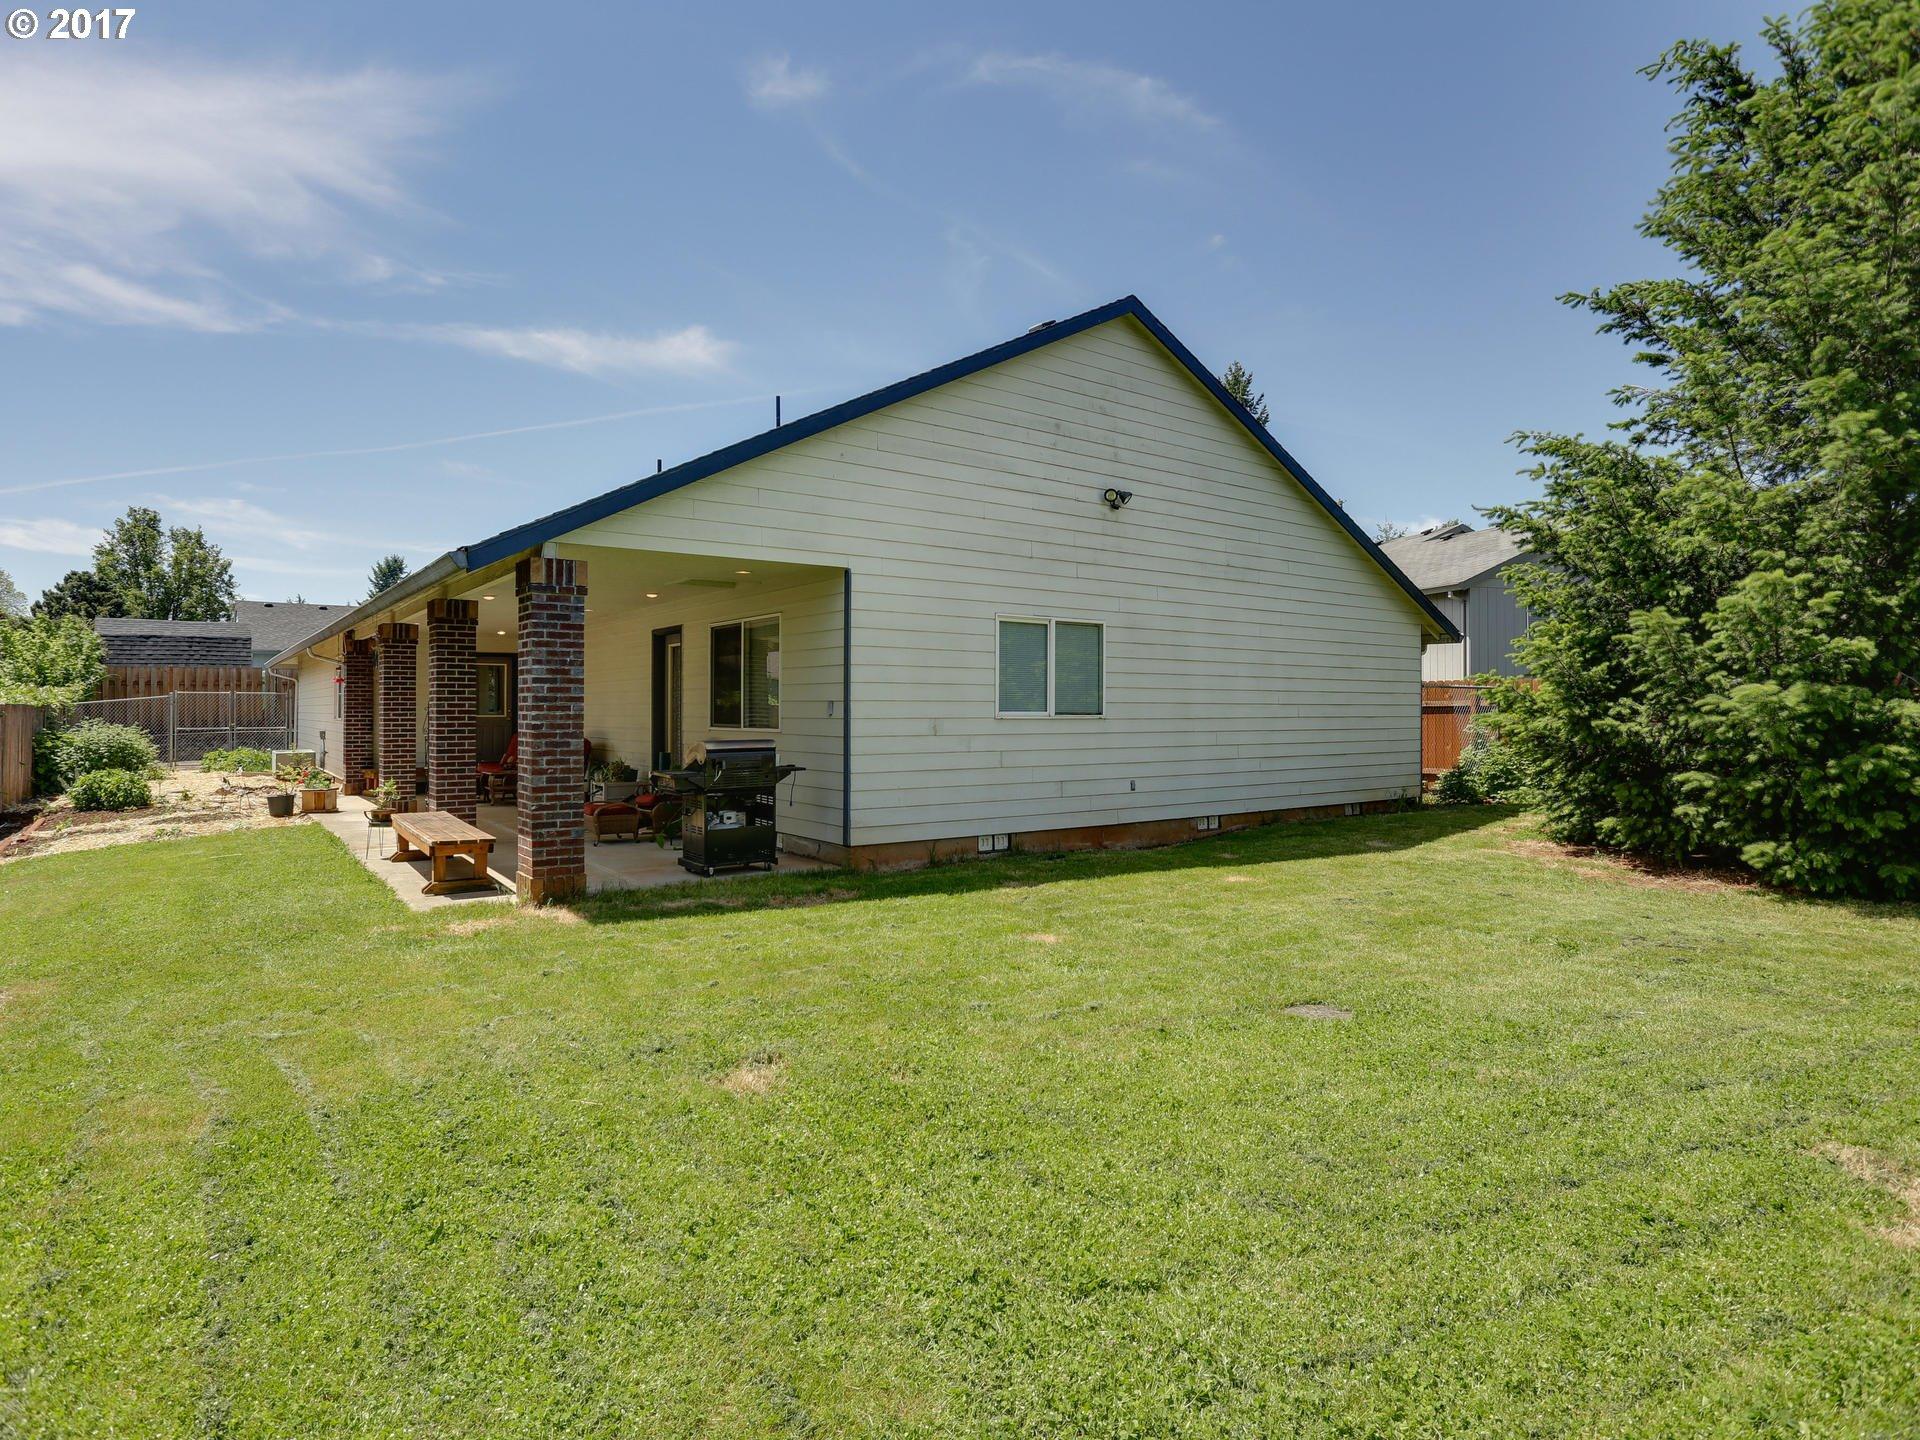 19216 COKERON DR Oregon City, OR 97045 - MLS #: 17633775